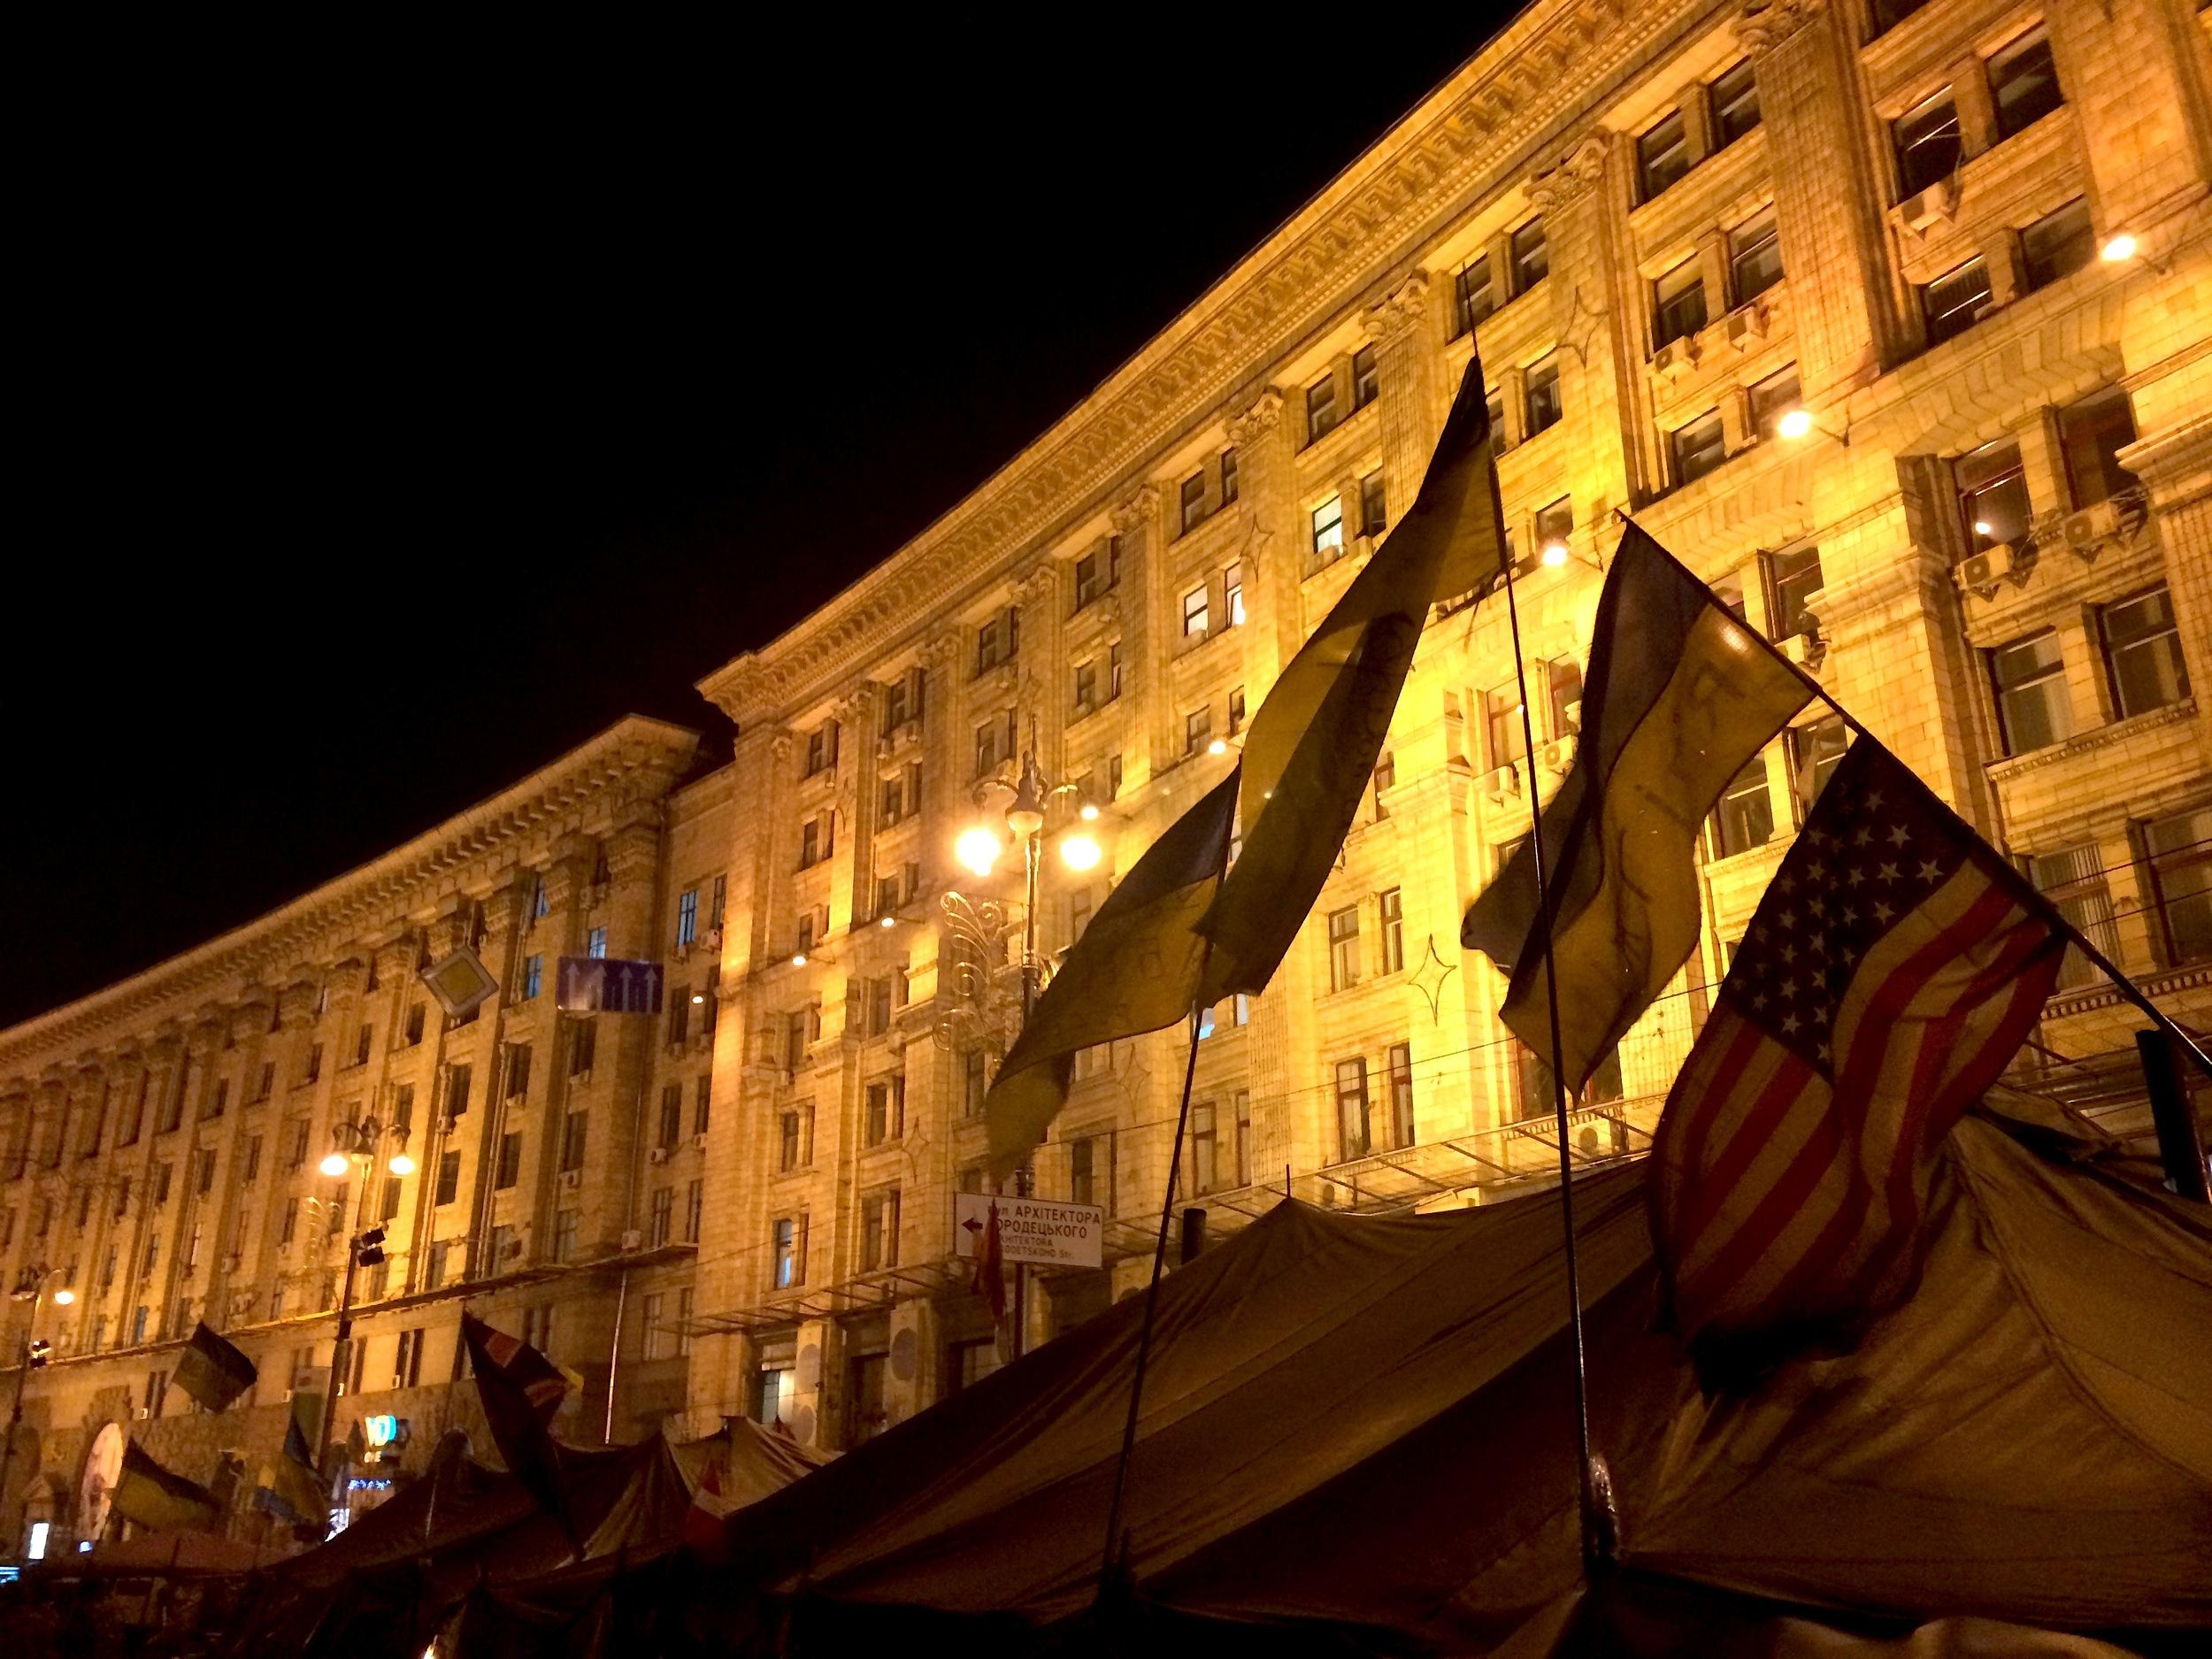 FLAG KIEV 1 EDIT.JPG